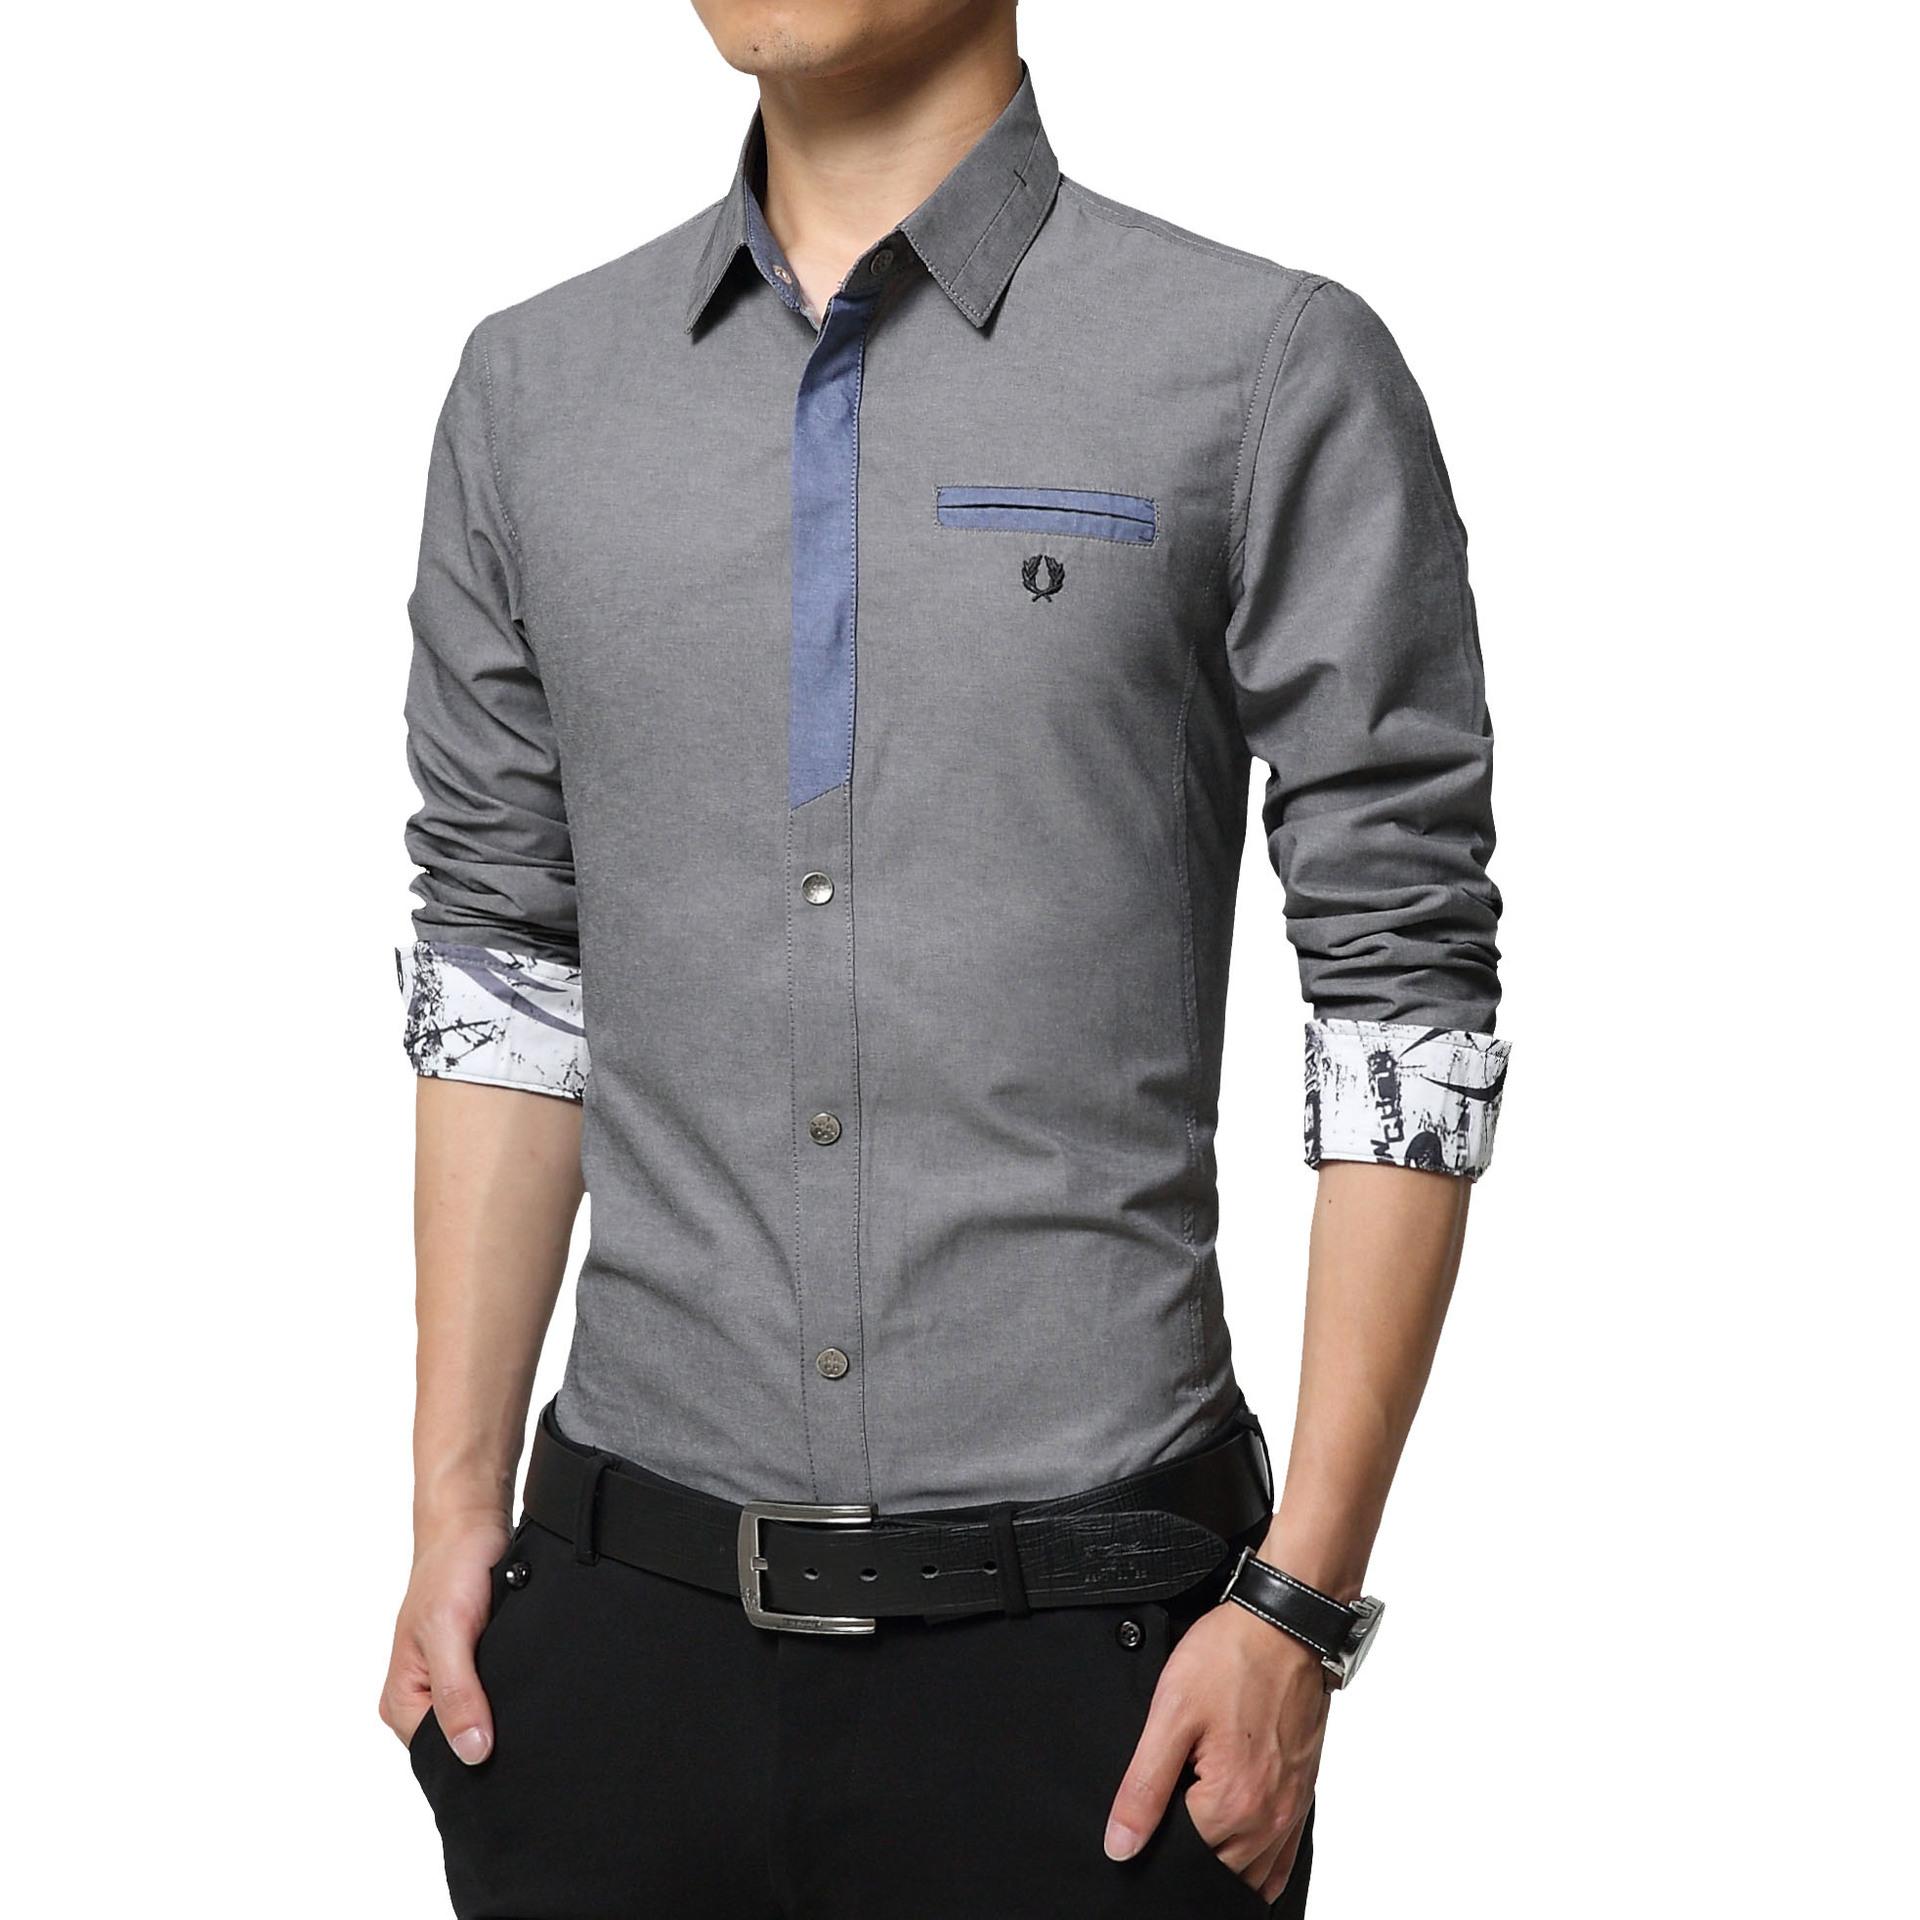 Floral Print Striped Dress Men Shirt Uniform Mens Long Sleeve Slim Fit Top Vintage Cotton Button Down Shirts Camisa Masculina 37